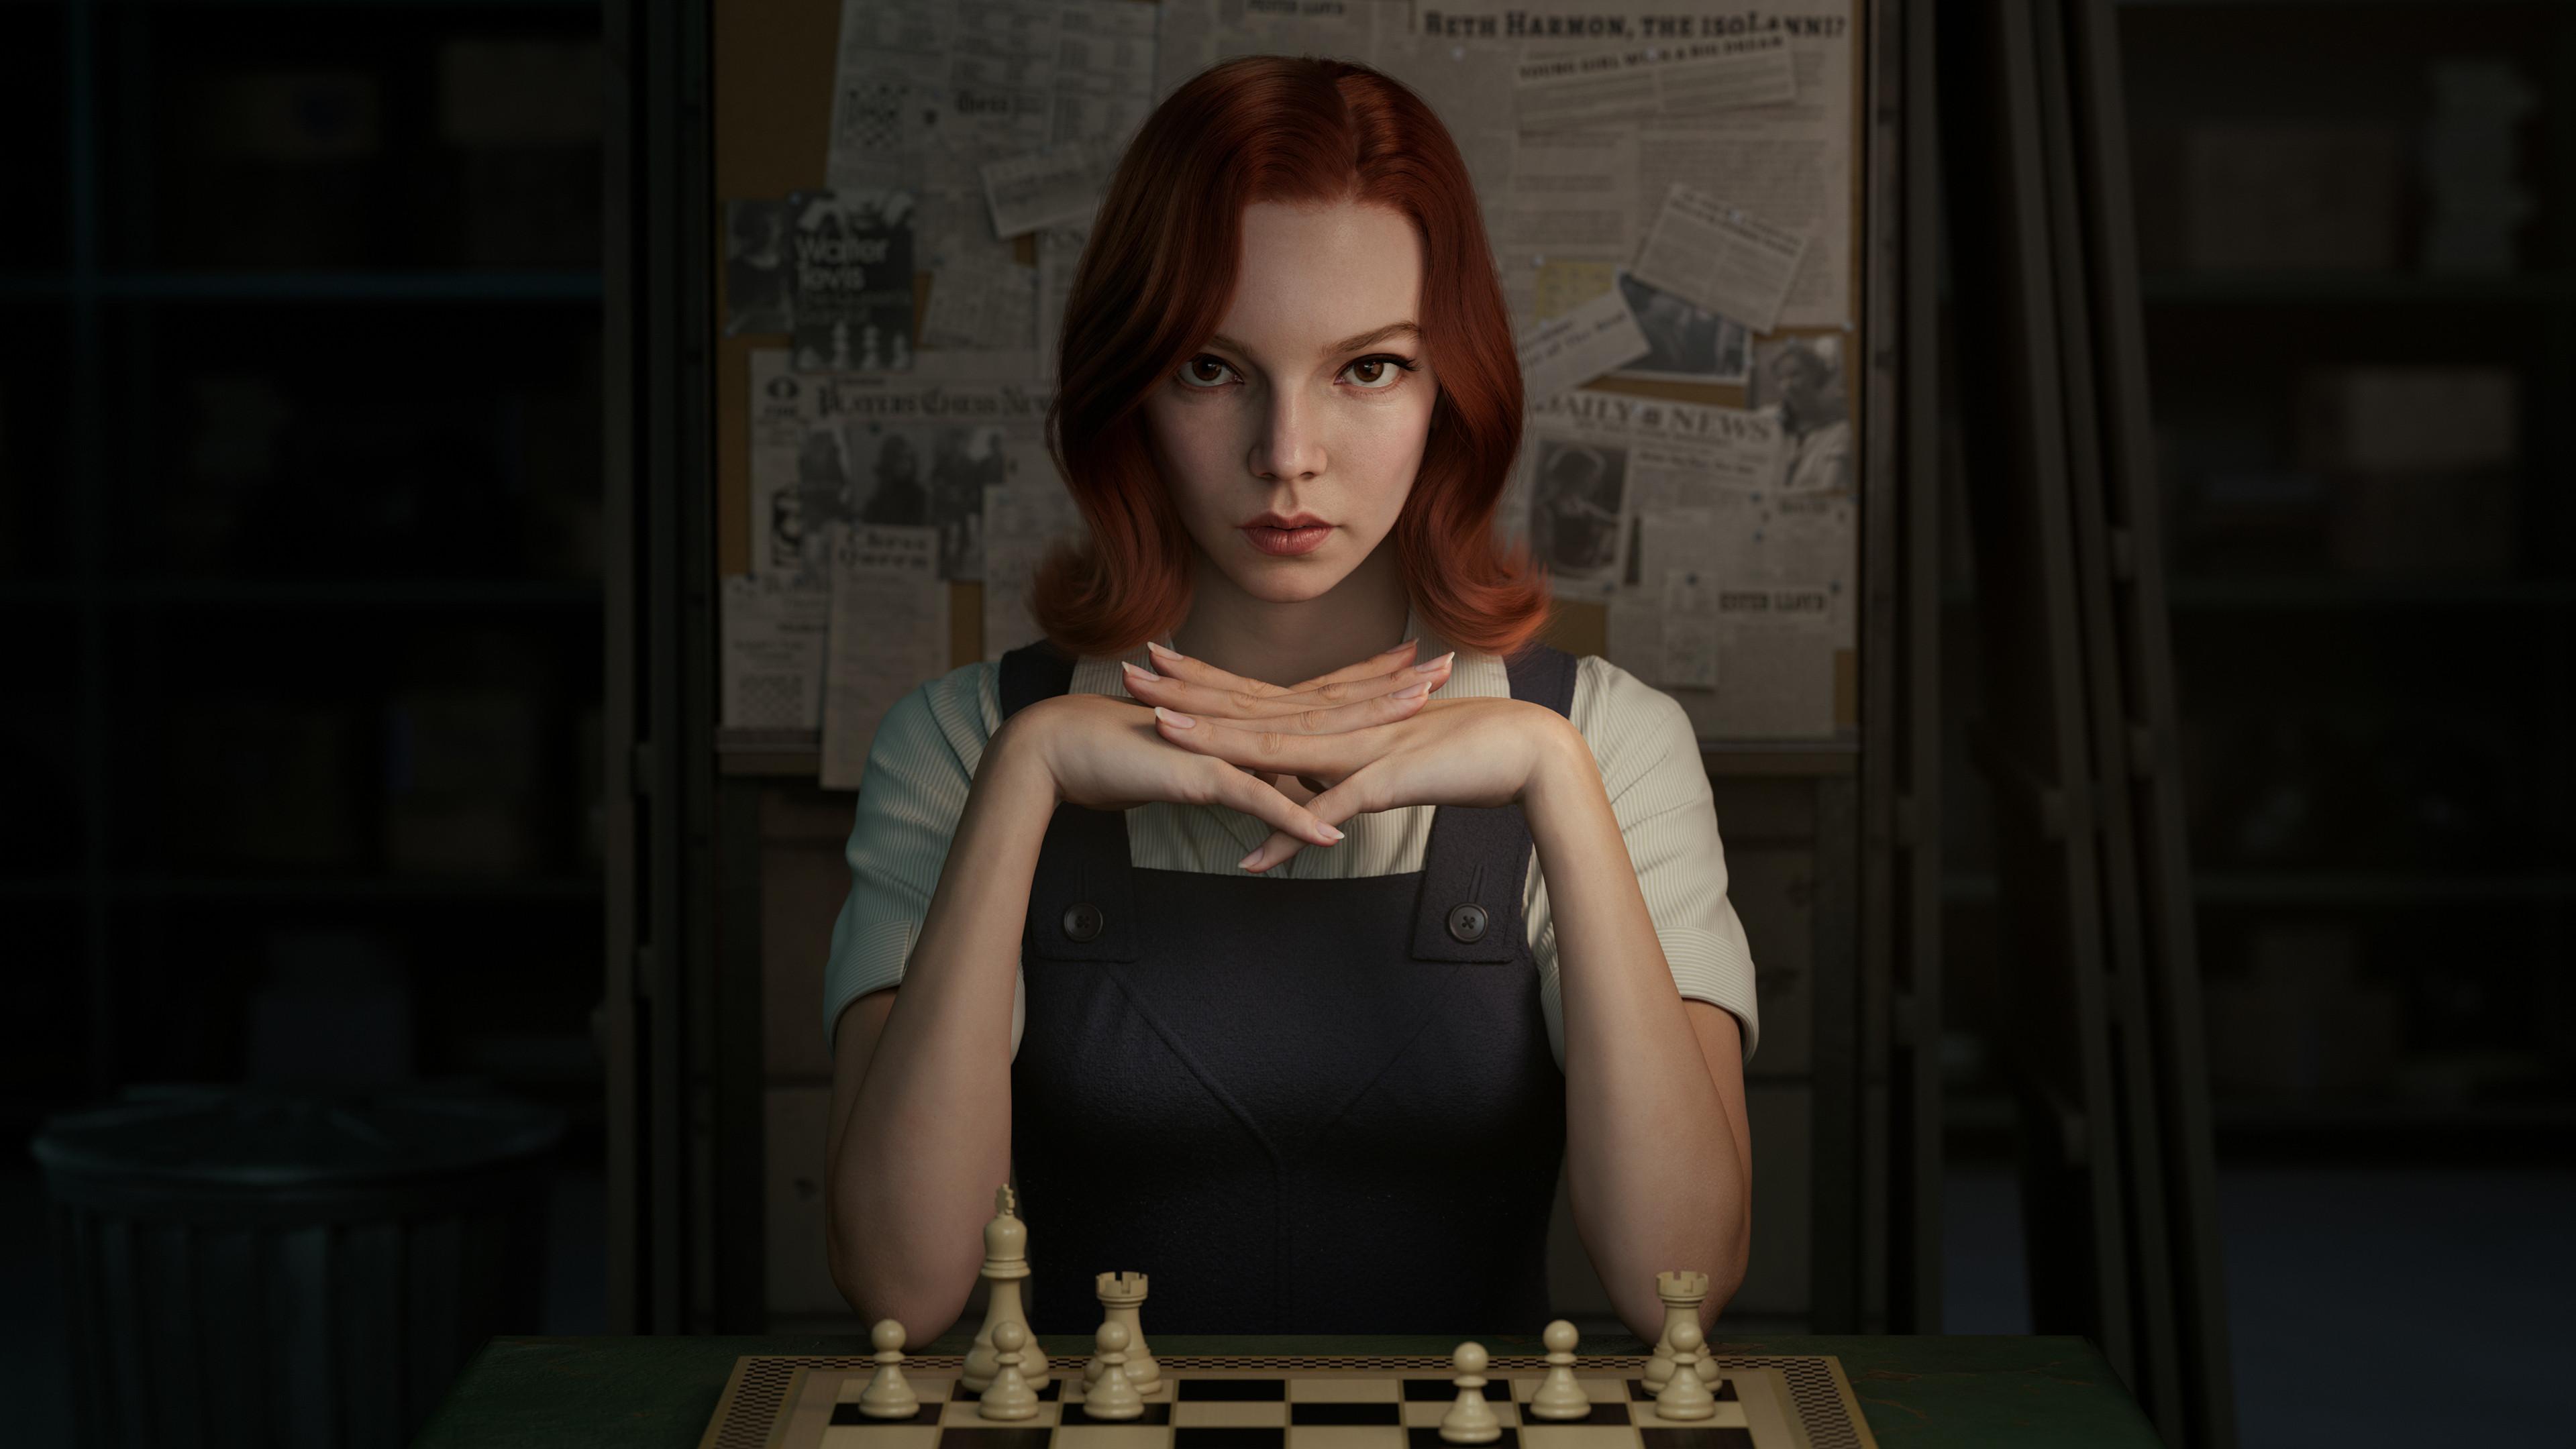 General 3839x2160 ArtStation redhead looking at viewer chess digital art digital painting Beth Harmon fan art artwork Anya Taylor-Joy  CGI 3D Xie Boli The Queen's Gambit